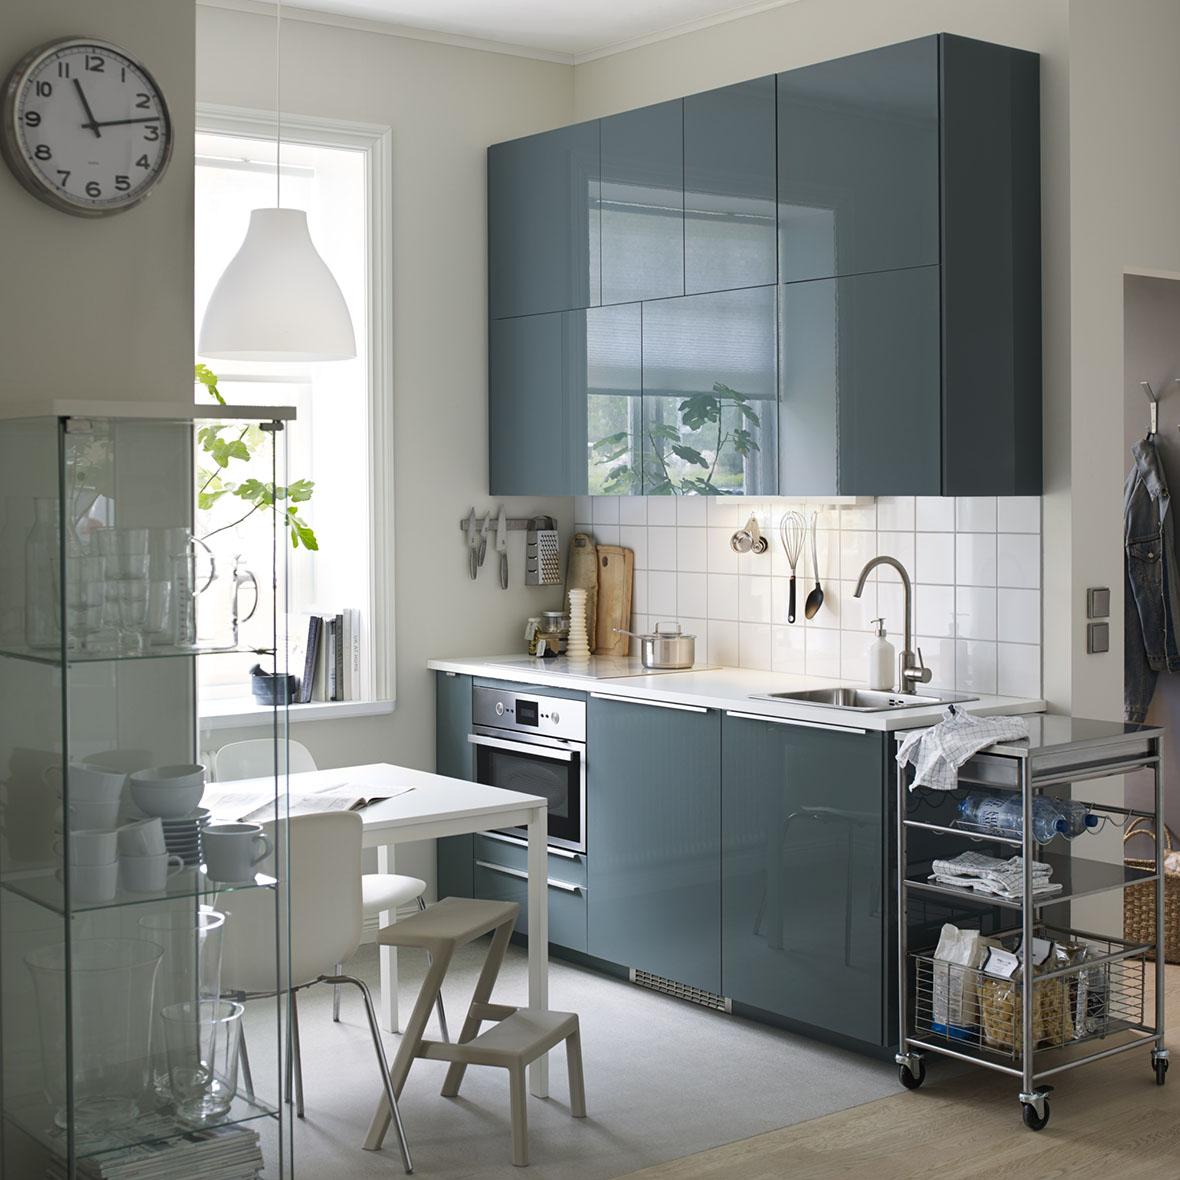 Ikea En Asas Armarios Cocina De Para c34AjqL5R